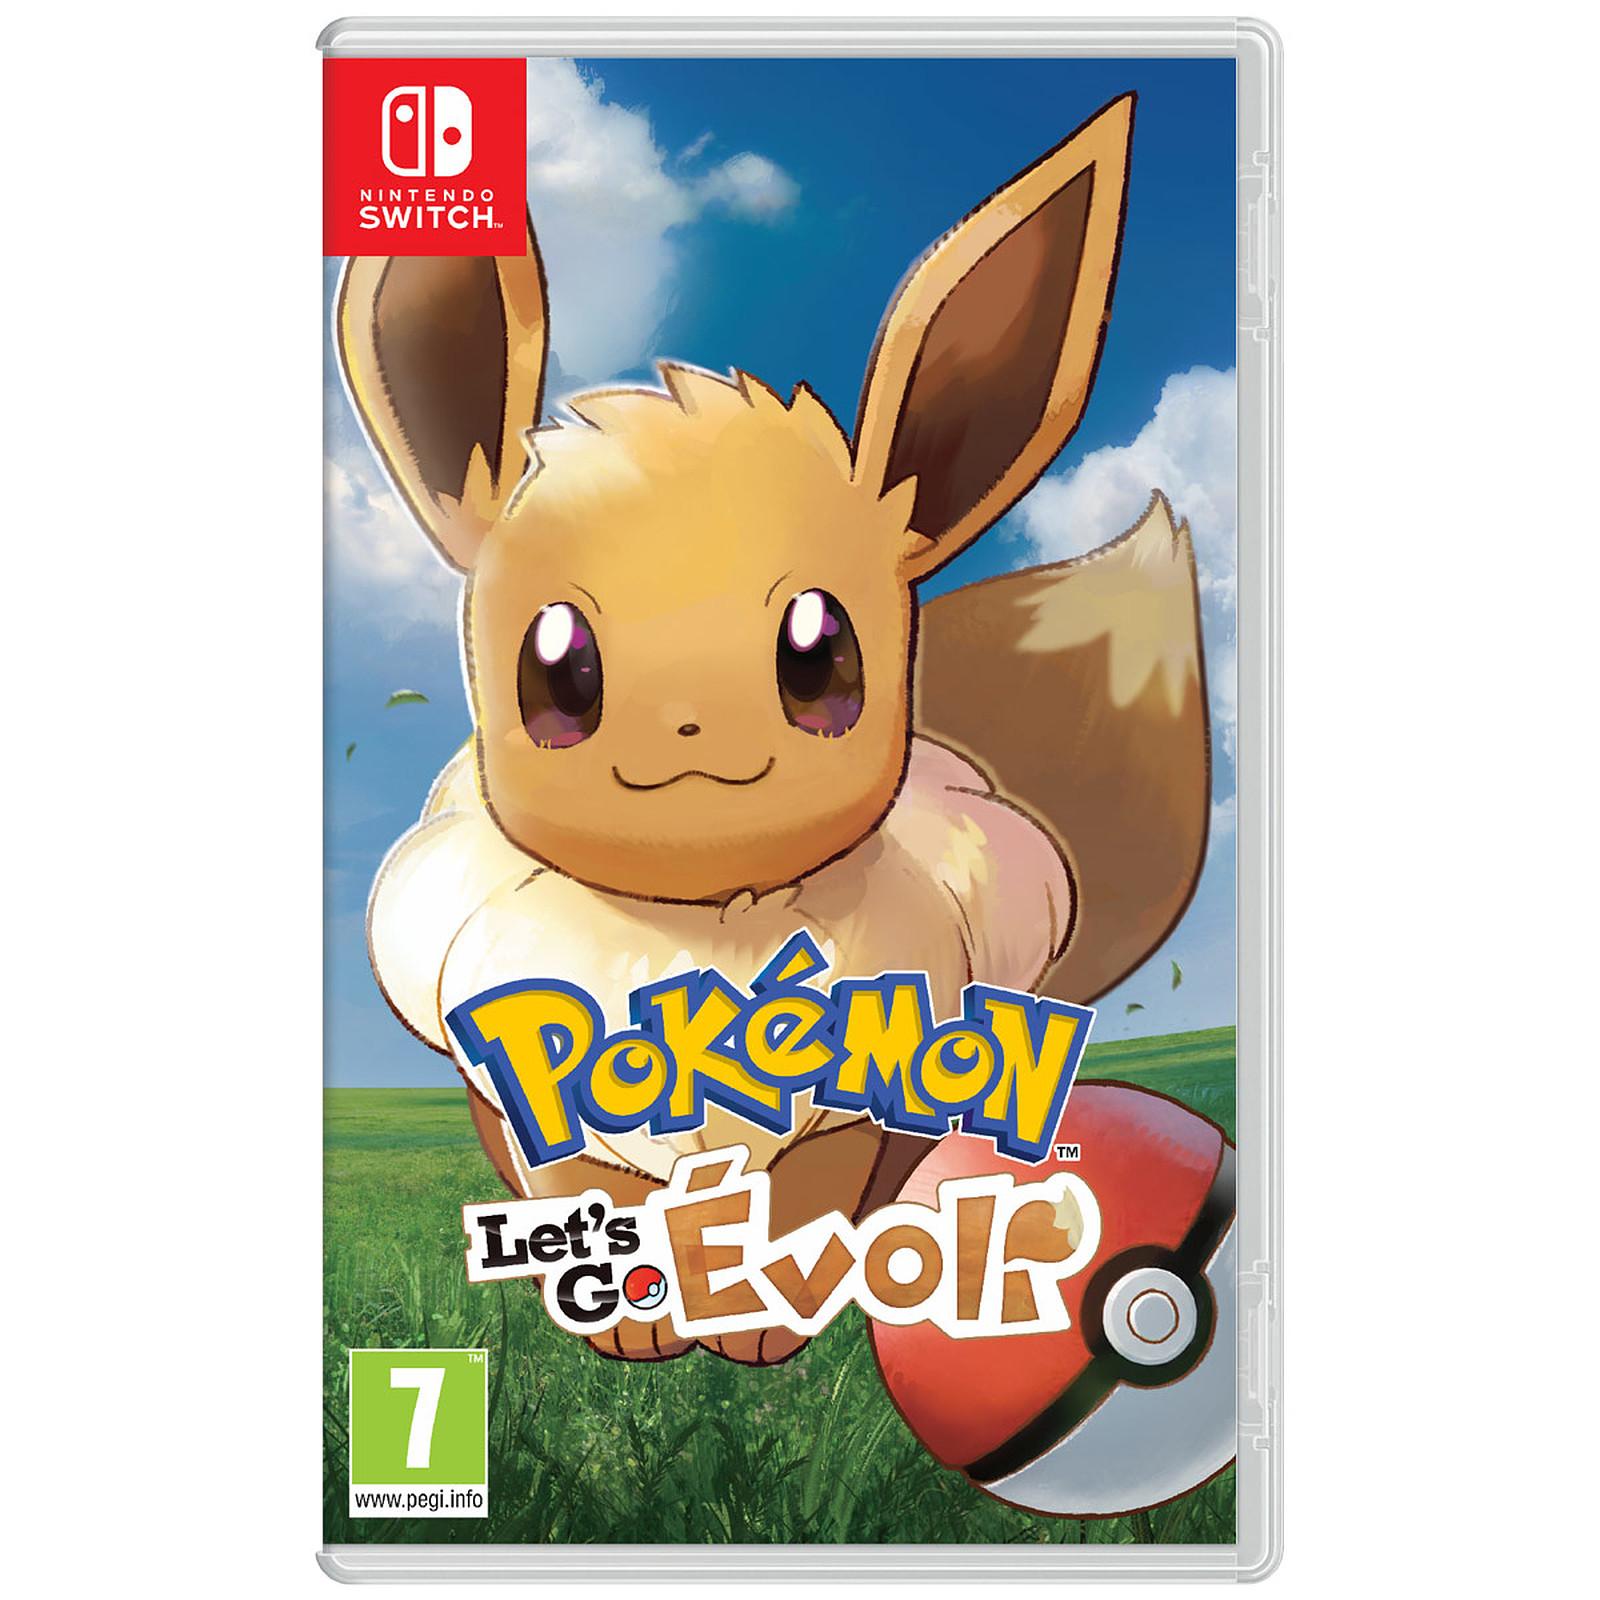 Pokémon : Let's Go - Pikachu ou Évoli sur Nintendo Switch